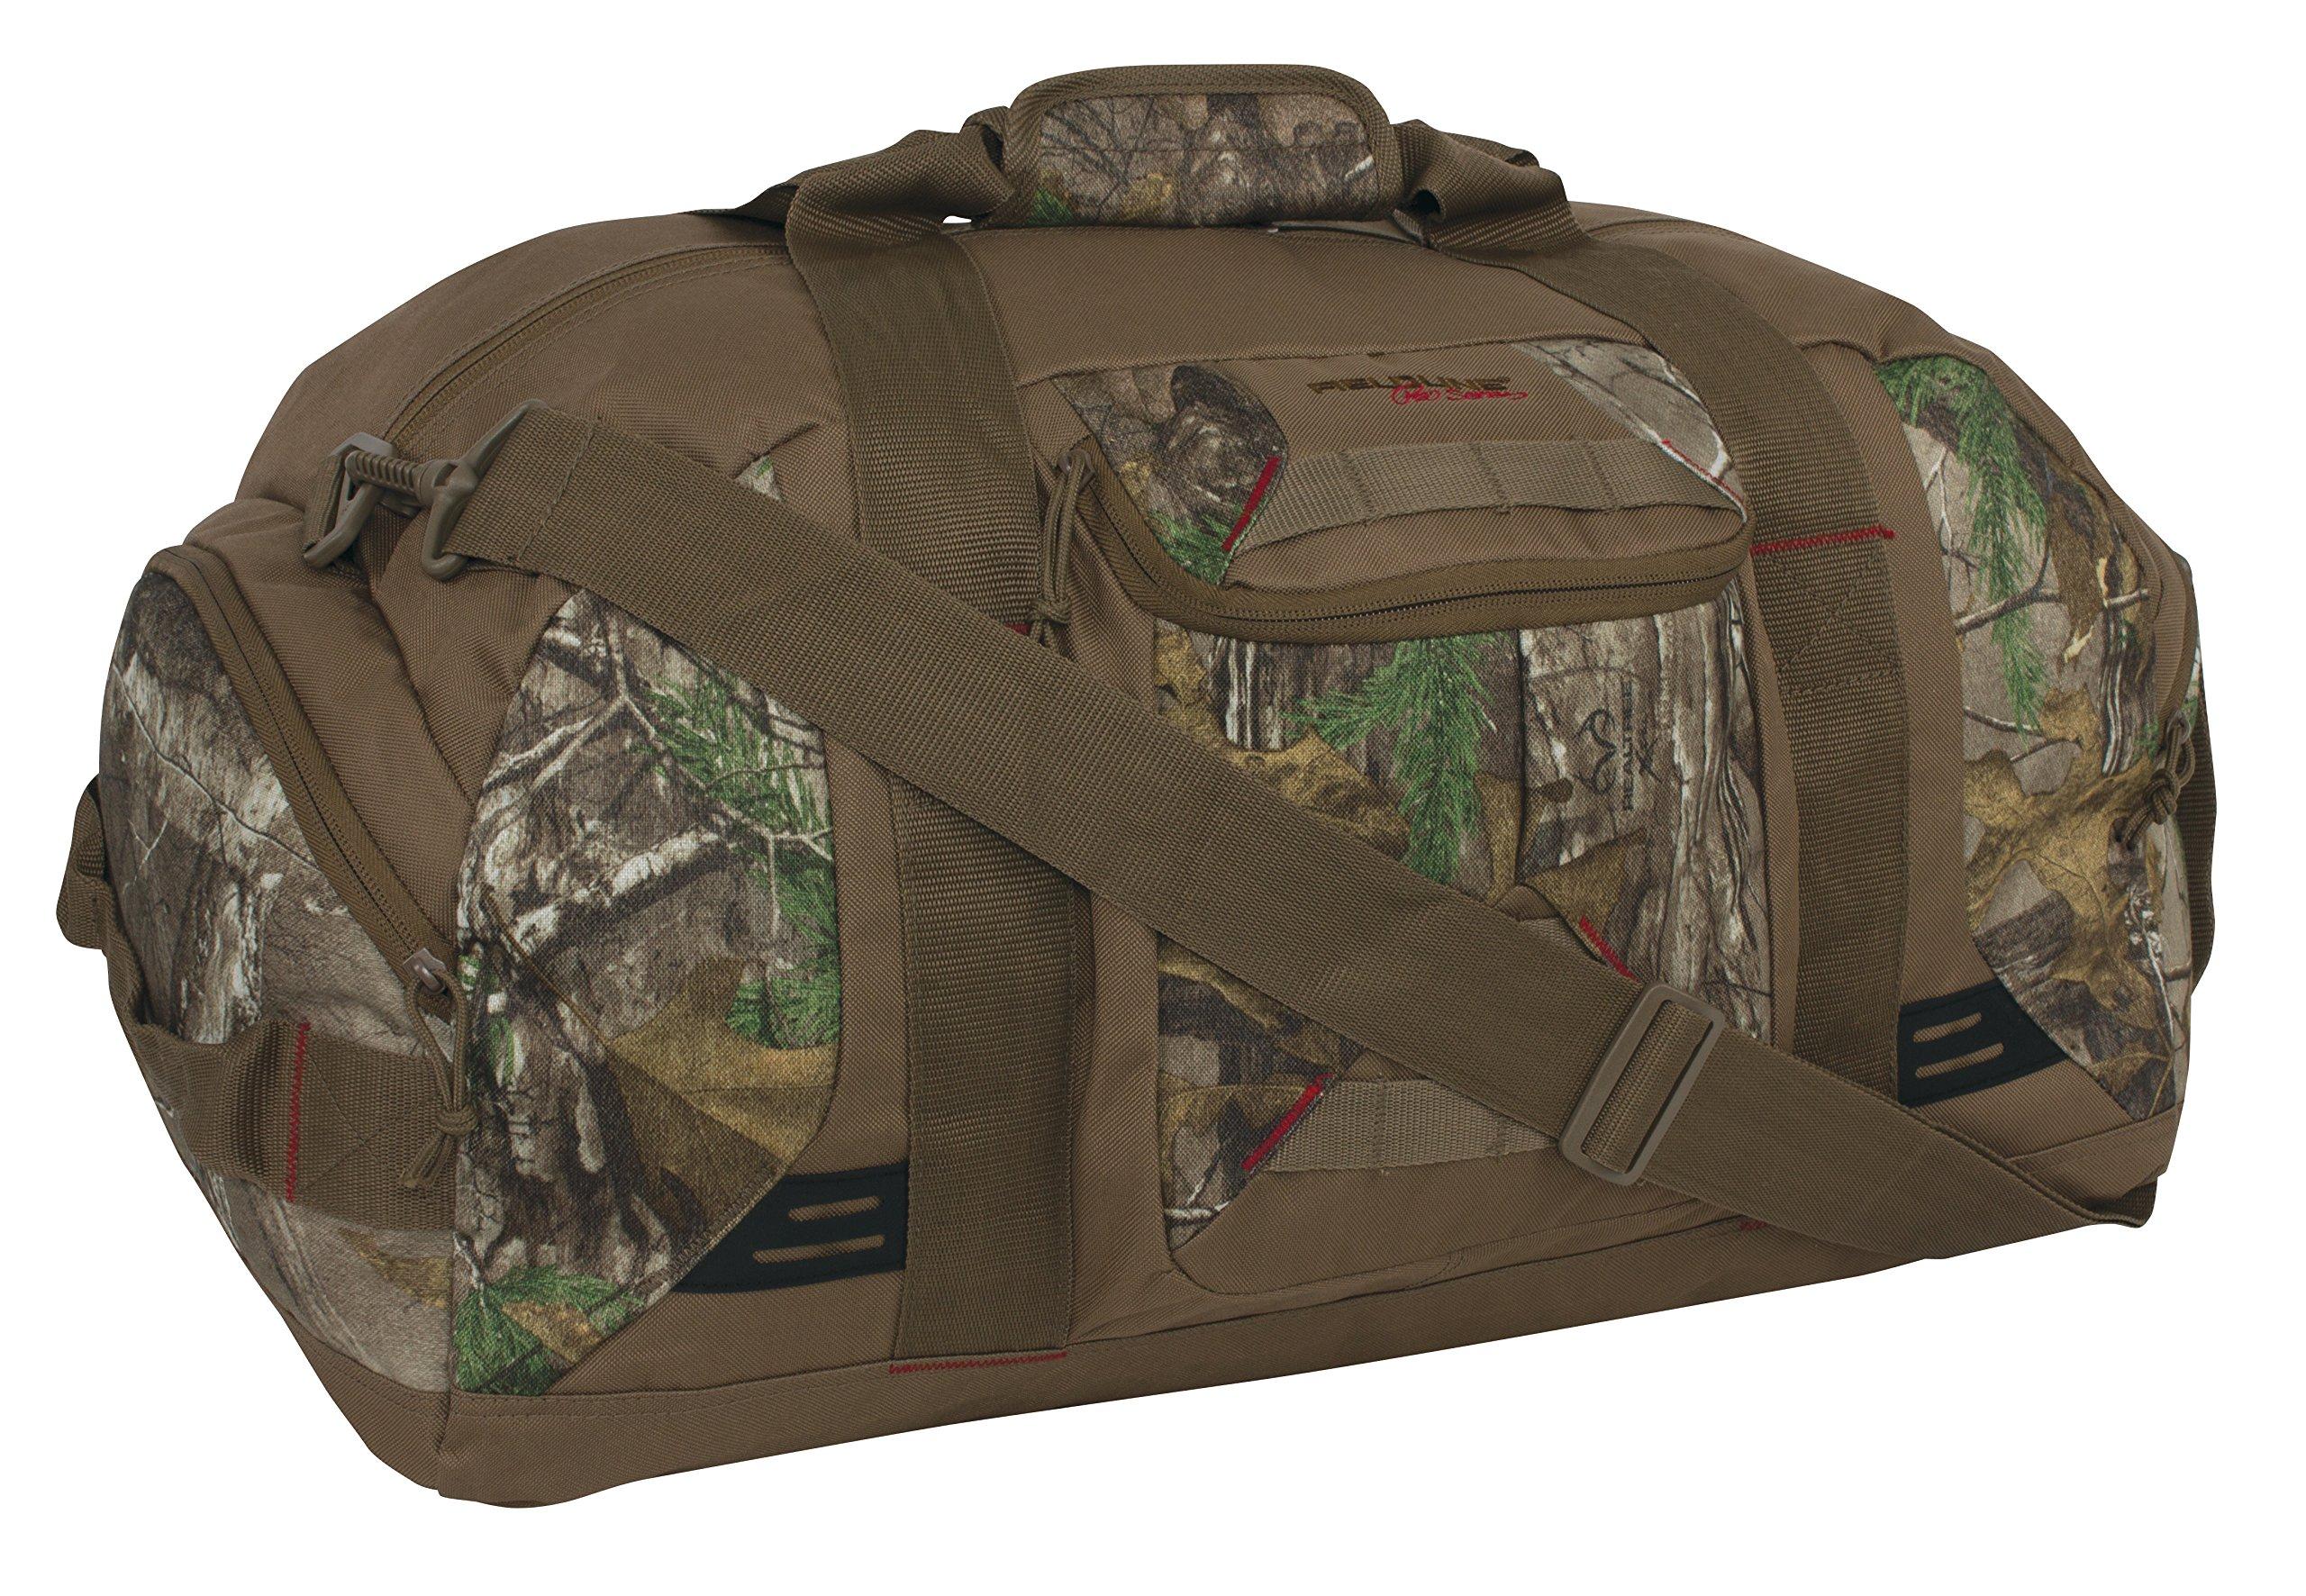 Fieldline Pro Ultimate Duffle Bag, Medium, RealTree Xtra